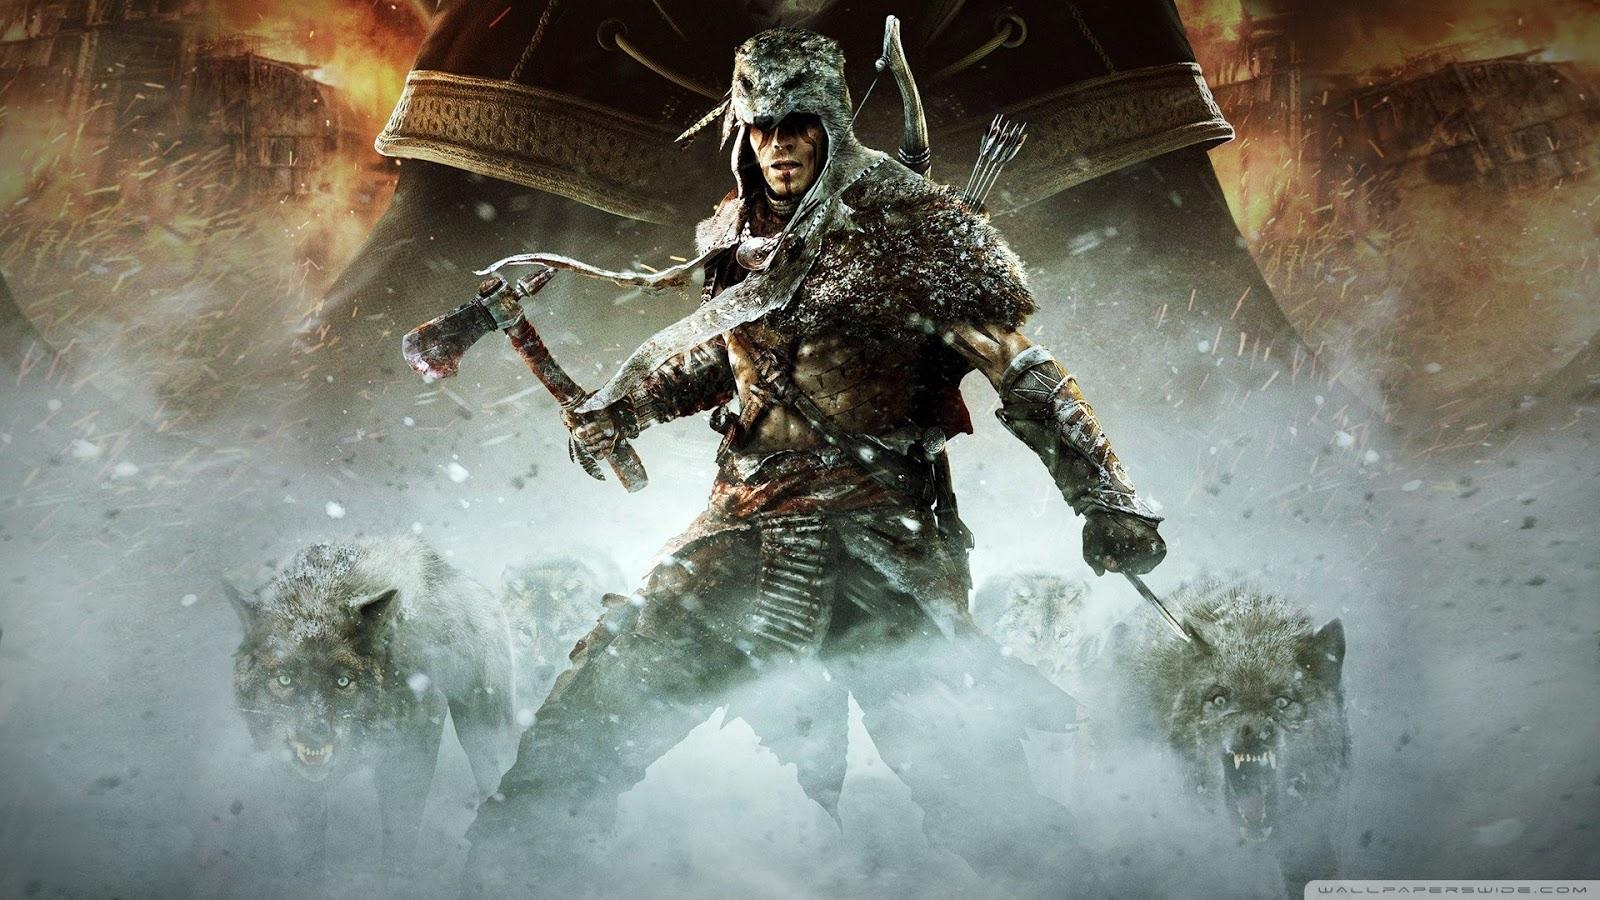 Wallpapers HD Wallpapers de Assassins Creed 3 2012 1920x1080 HD 11 1600x900